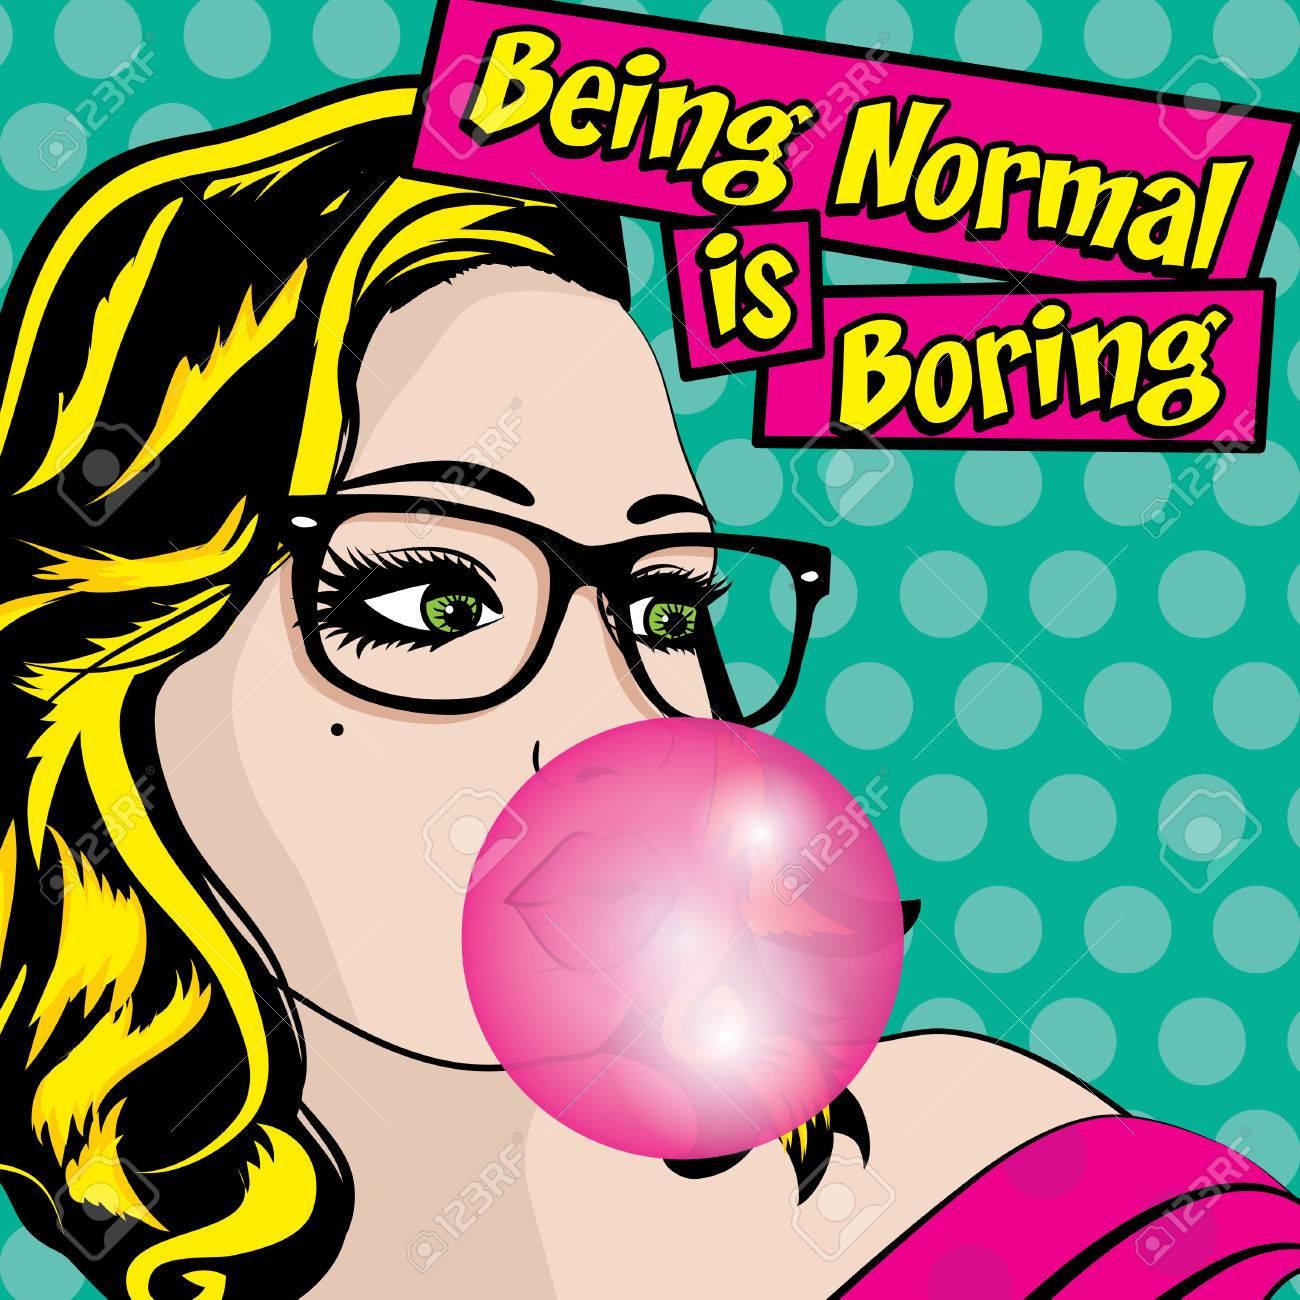 Women are boring